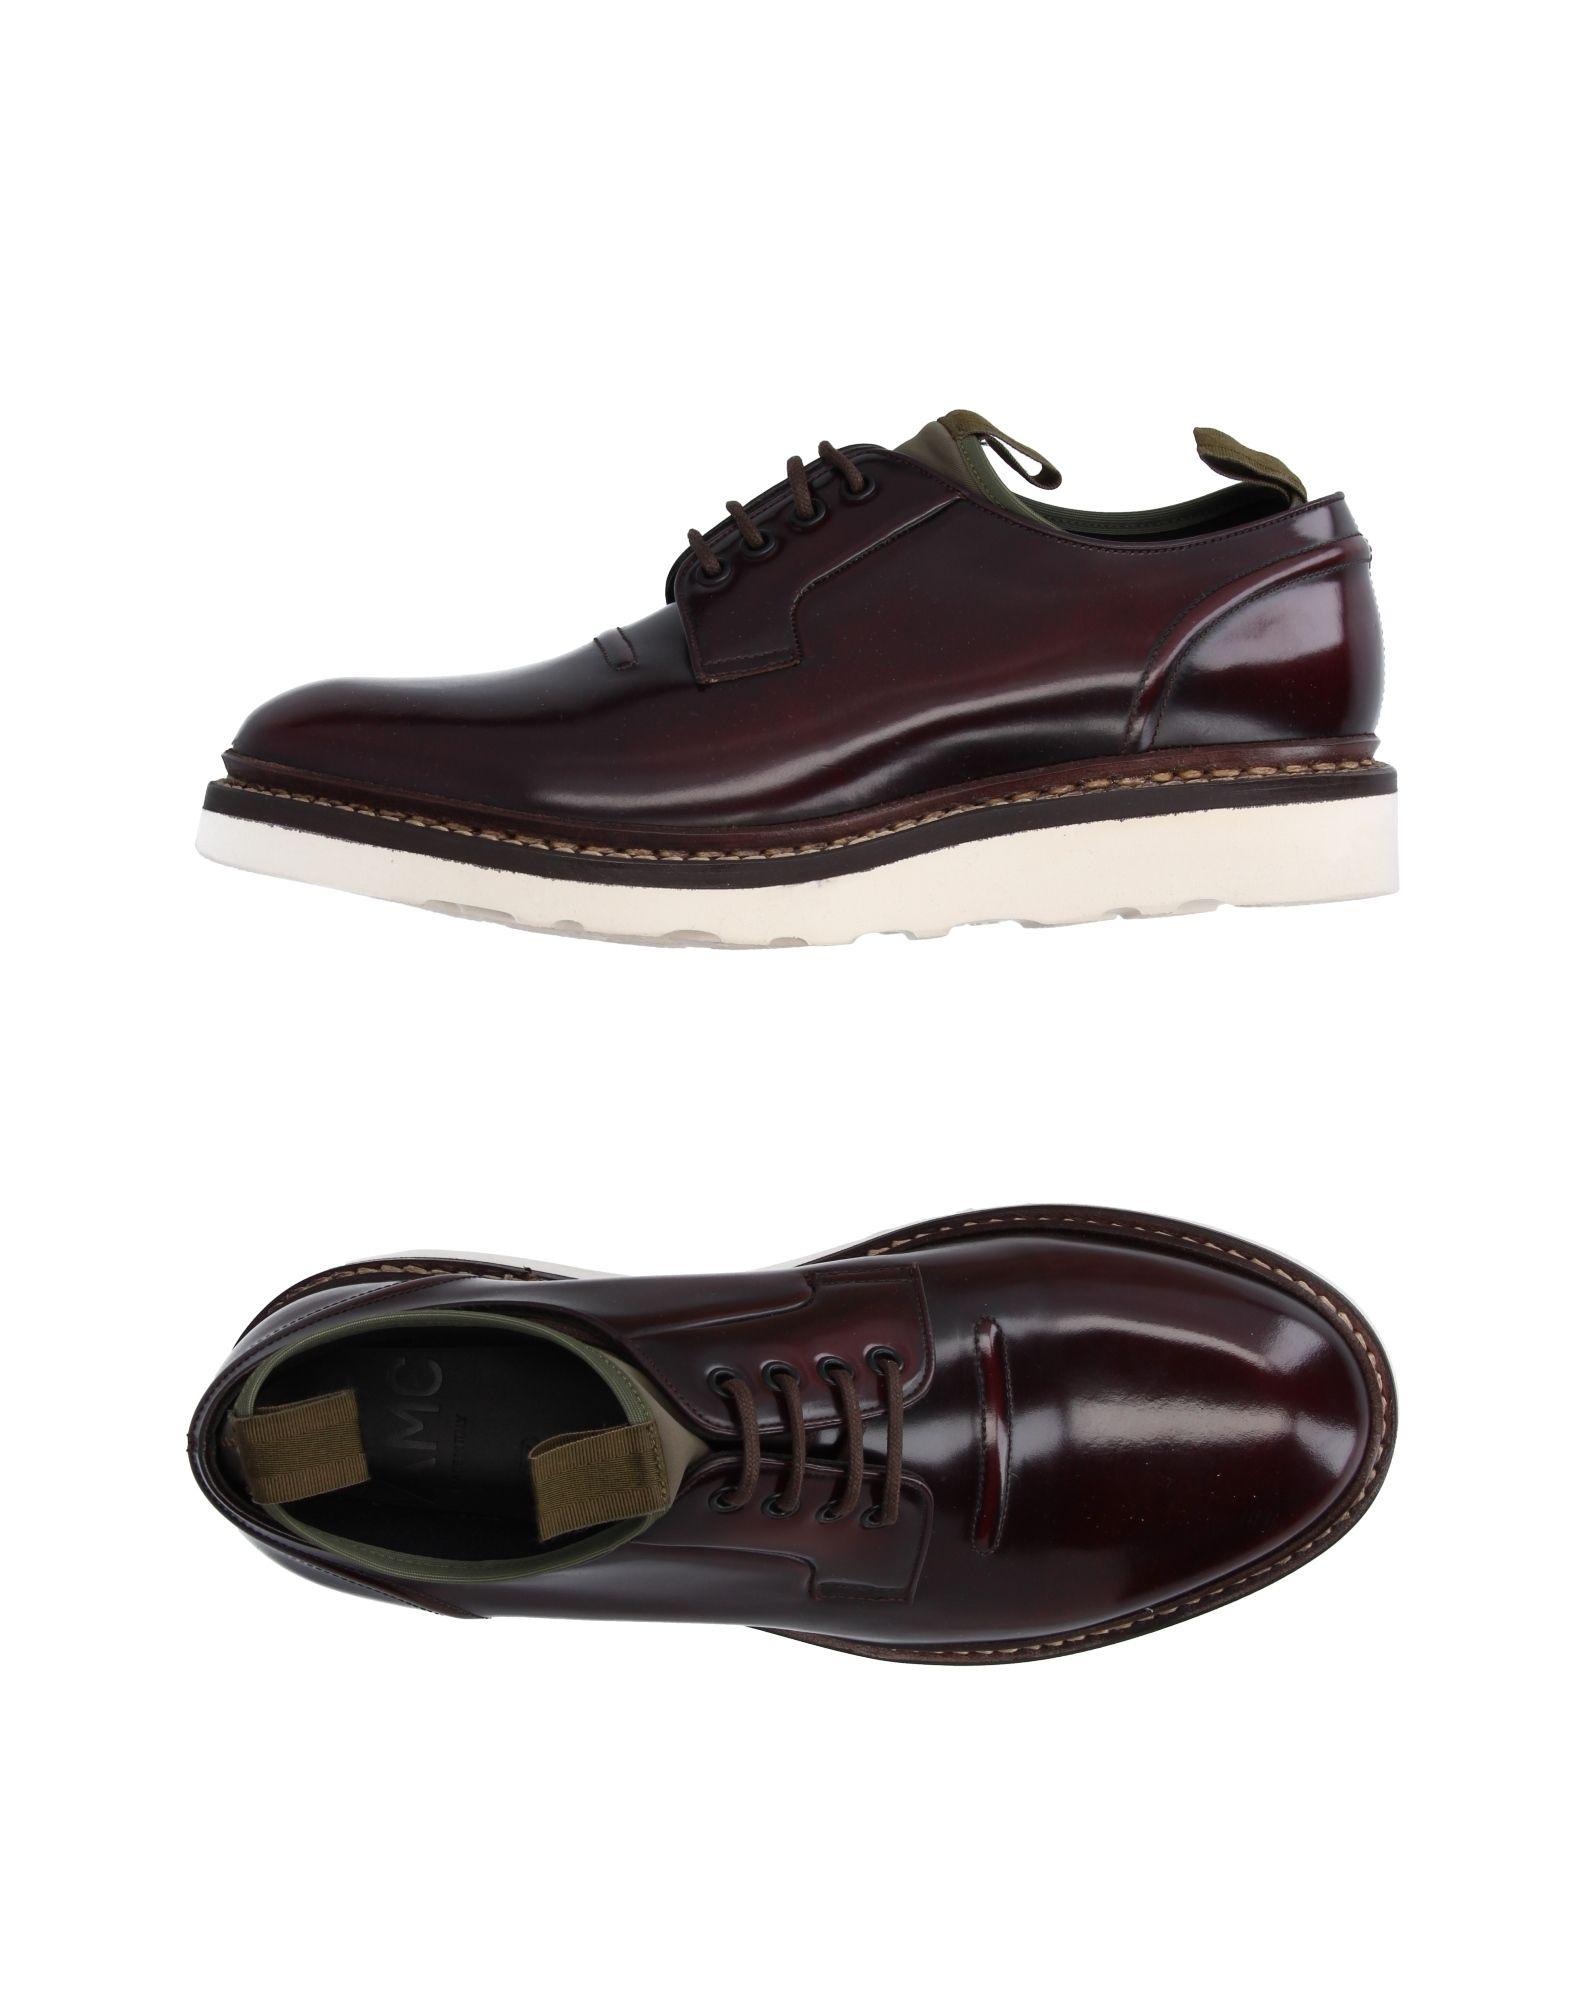 Oamc Schnürschuhe Herren  11215909TI Gute Qualität beliebte Schuhe